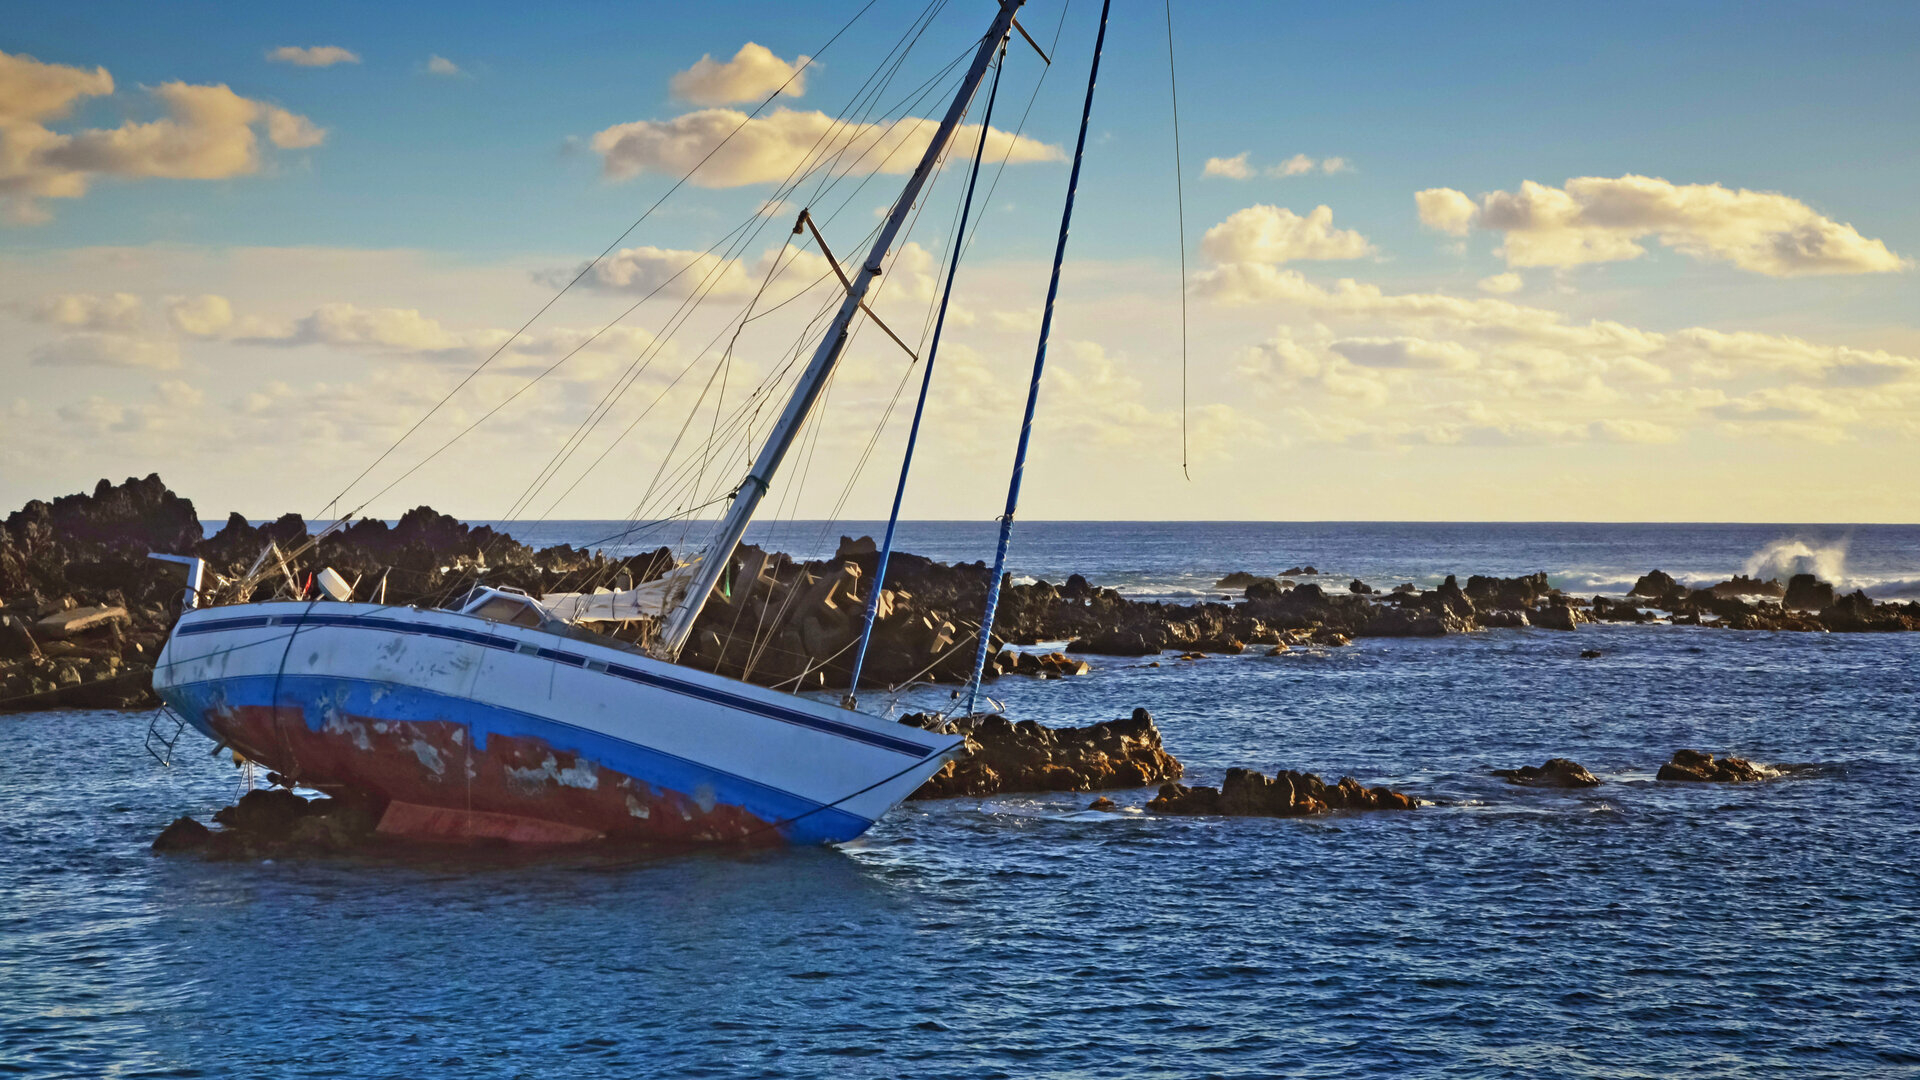 Bleu océan : Thon dans tous ses états